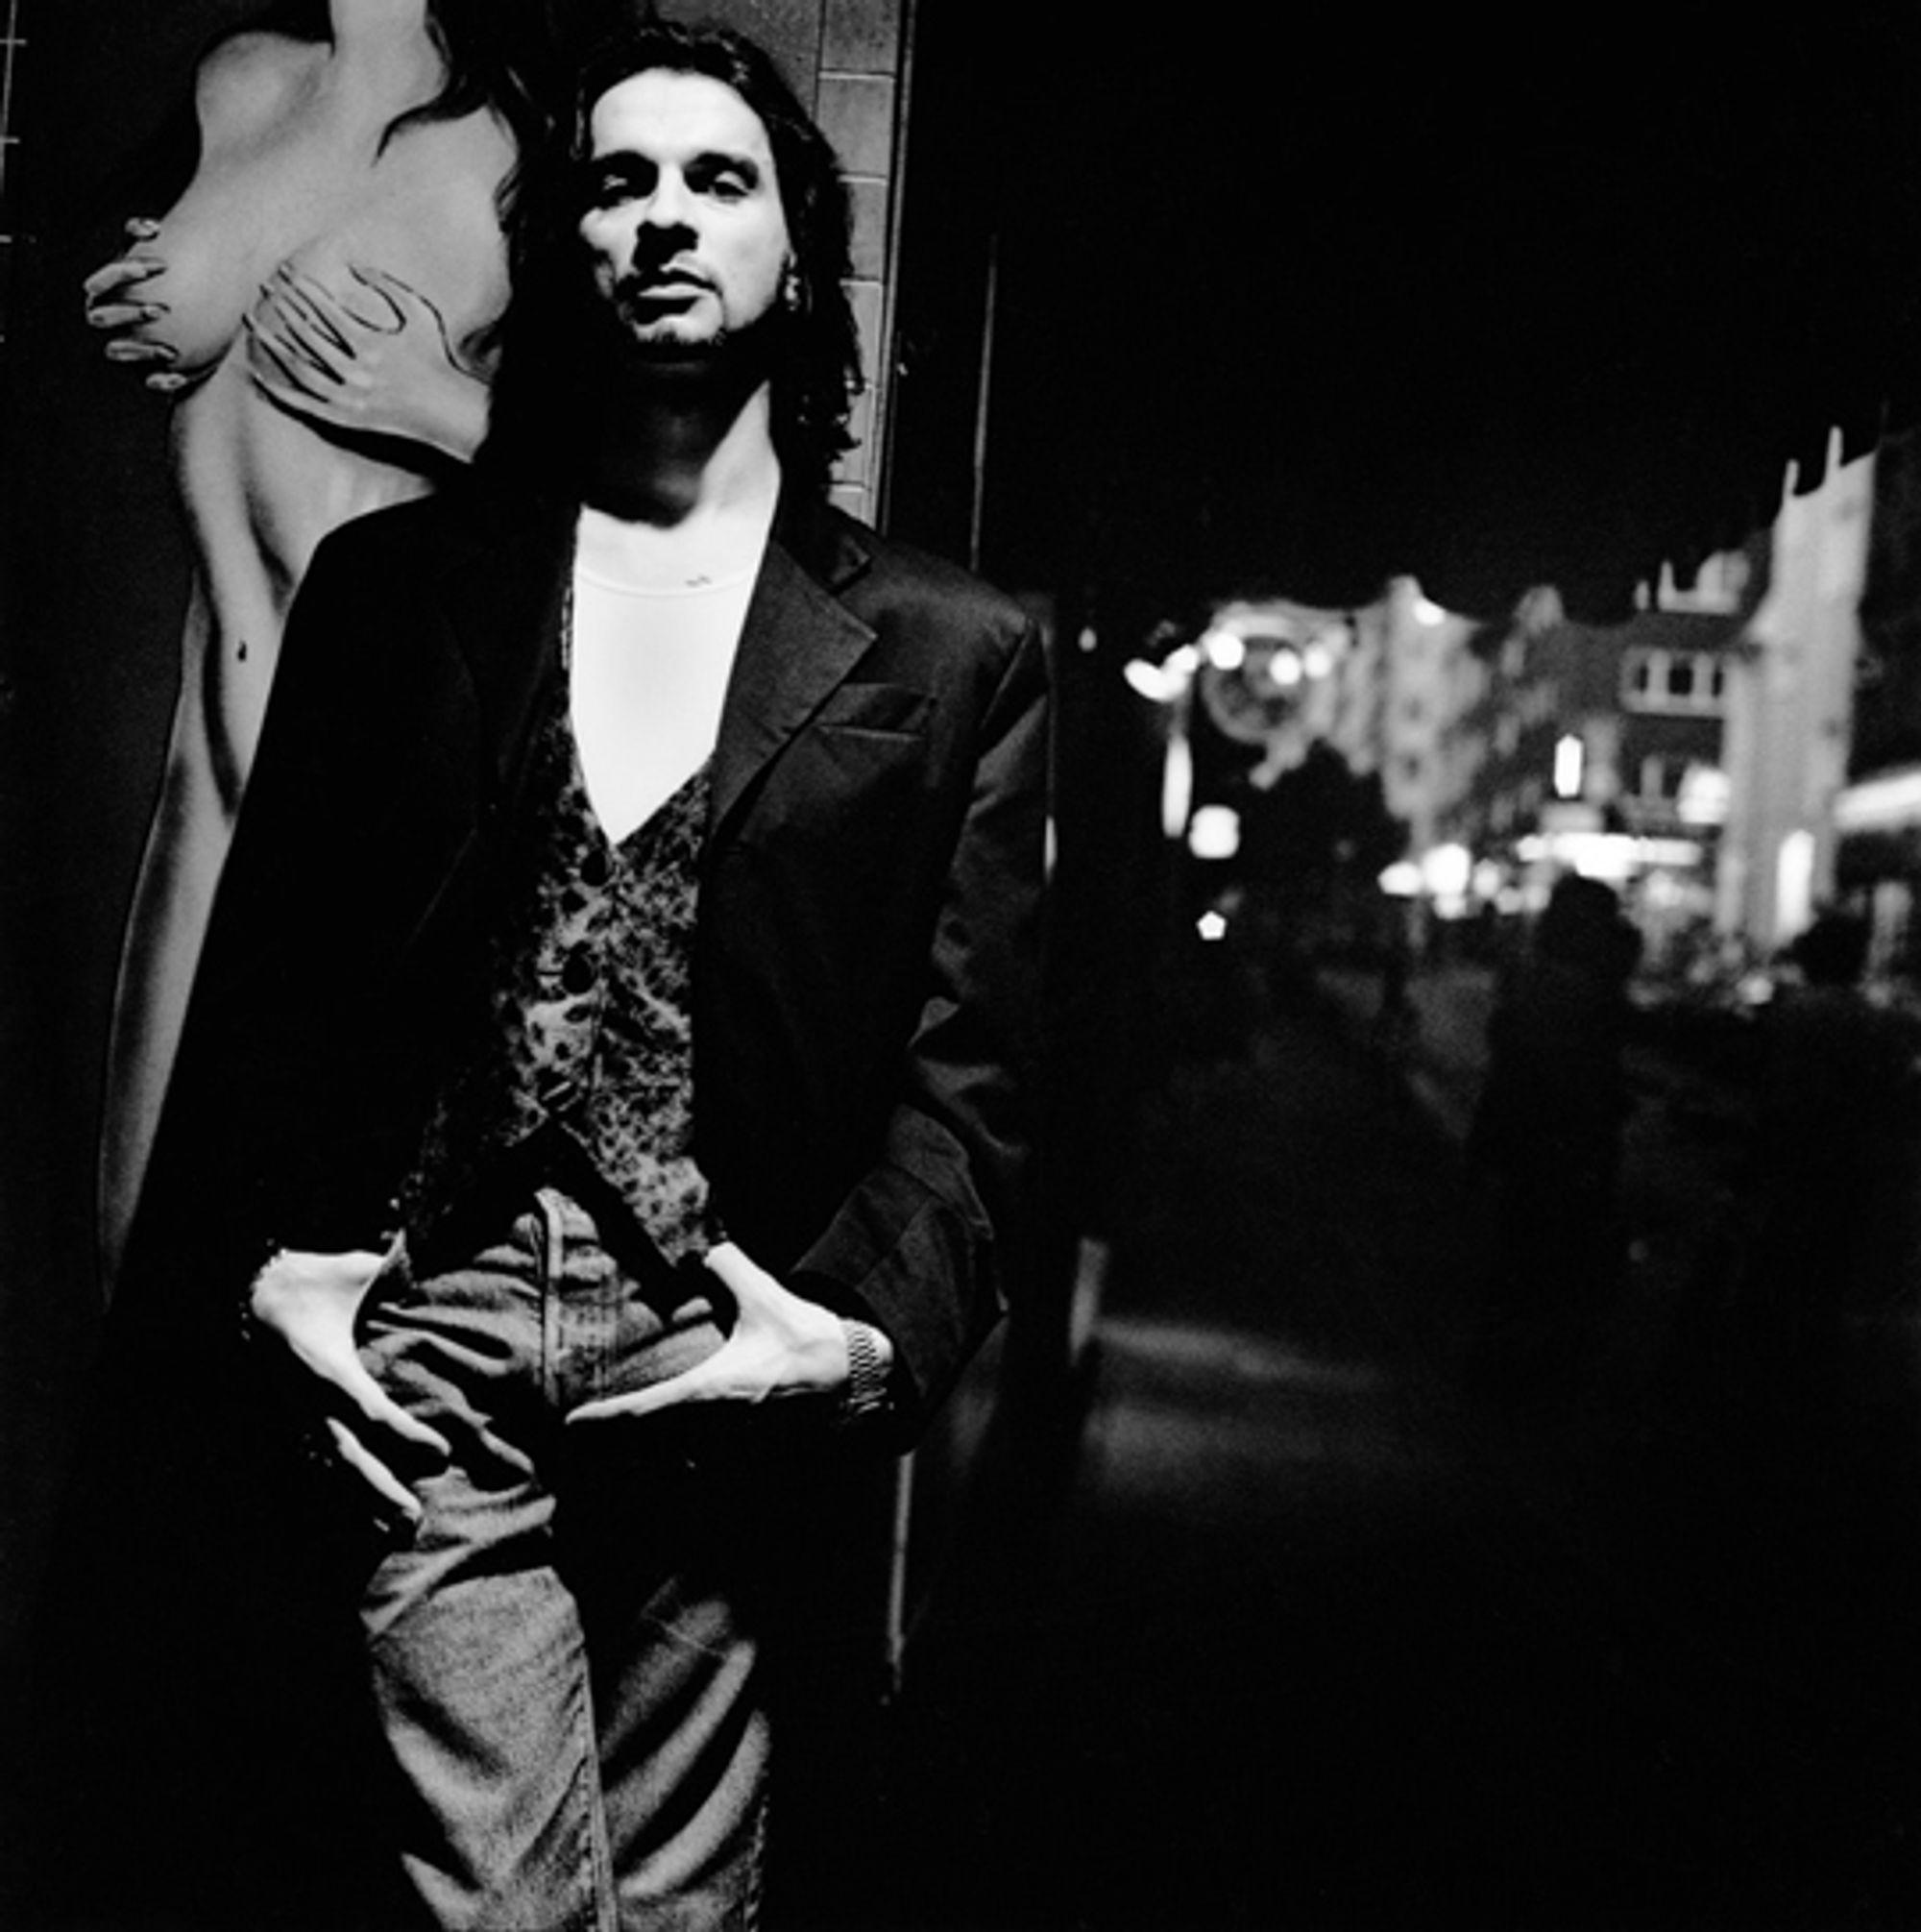 Dave Gahan, Hamburg 1993 © Anton Corbijn